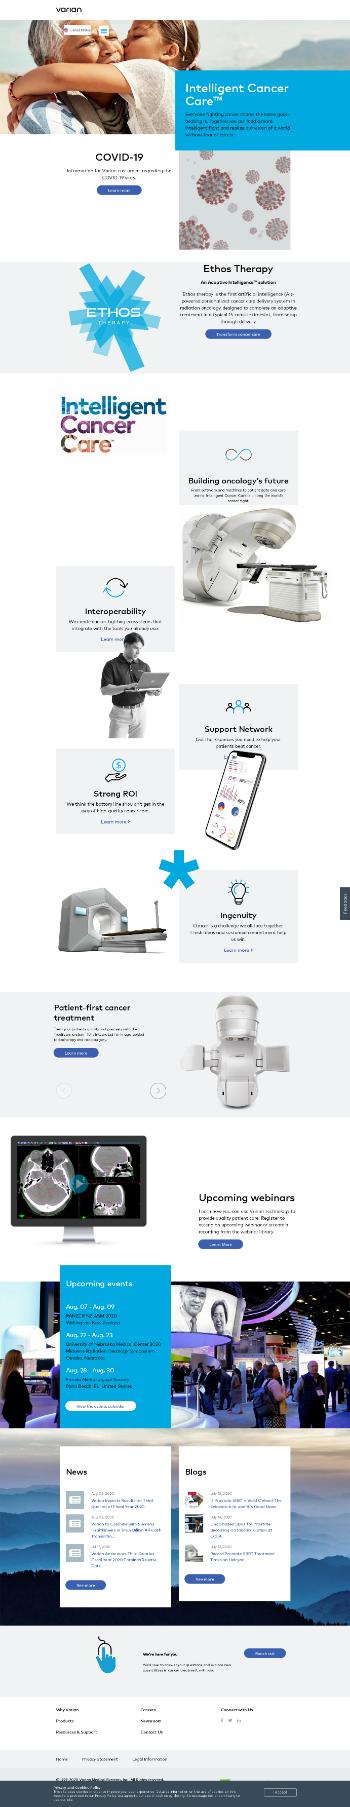 Varian Medical Systems, Inc. Website Screenshot